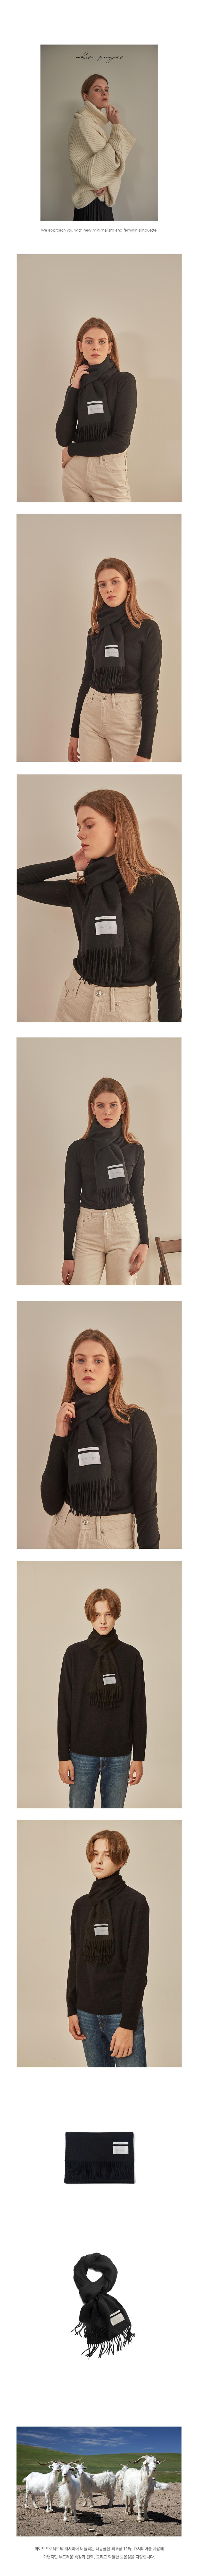 cashmere+black01.jpg